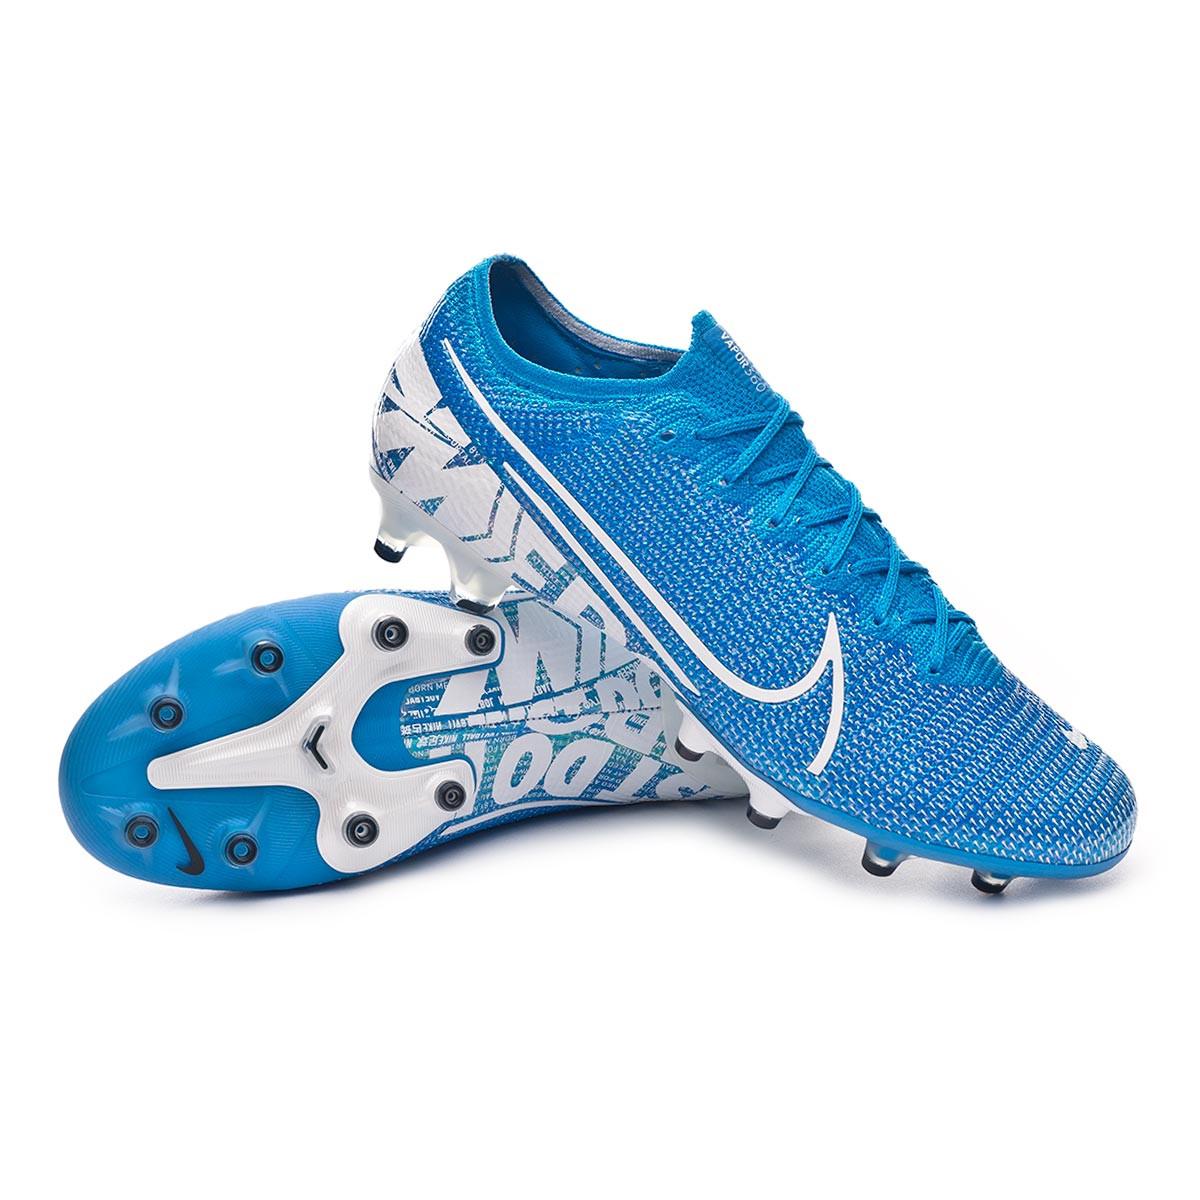 2019 Nike Air Max 95 Chaussures Officiel Running Prix Pas Cher Pour Femme Bleu Blanc 307960_400 1903130156 Chaussure de Basket | Nike Air Max Plus